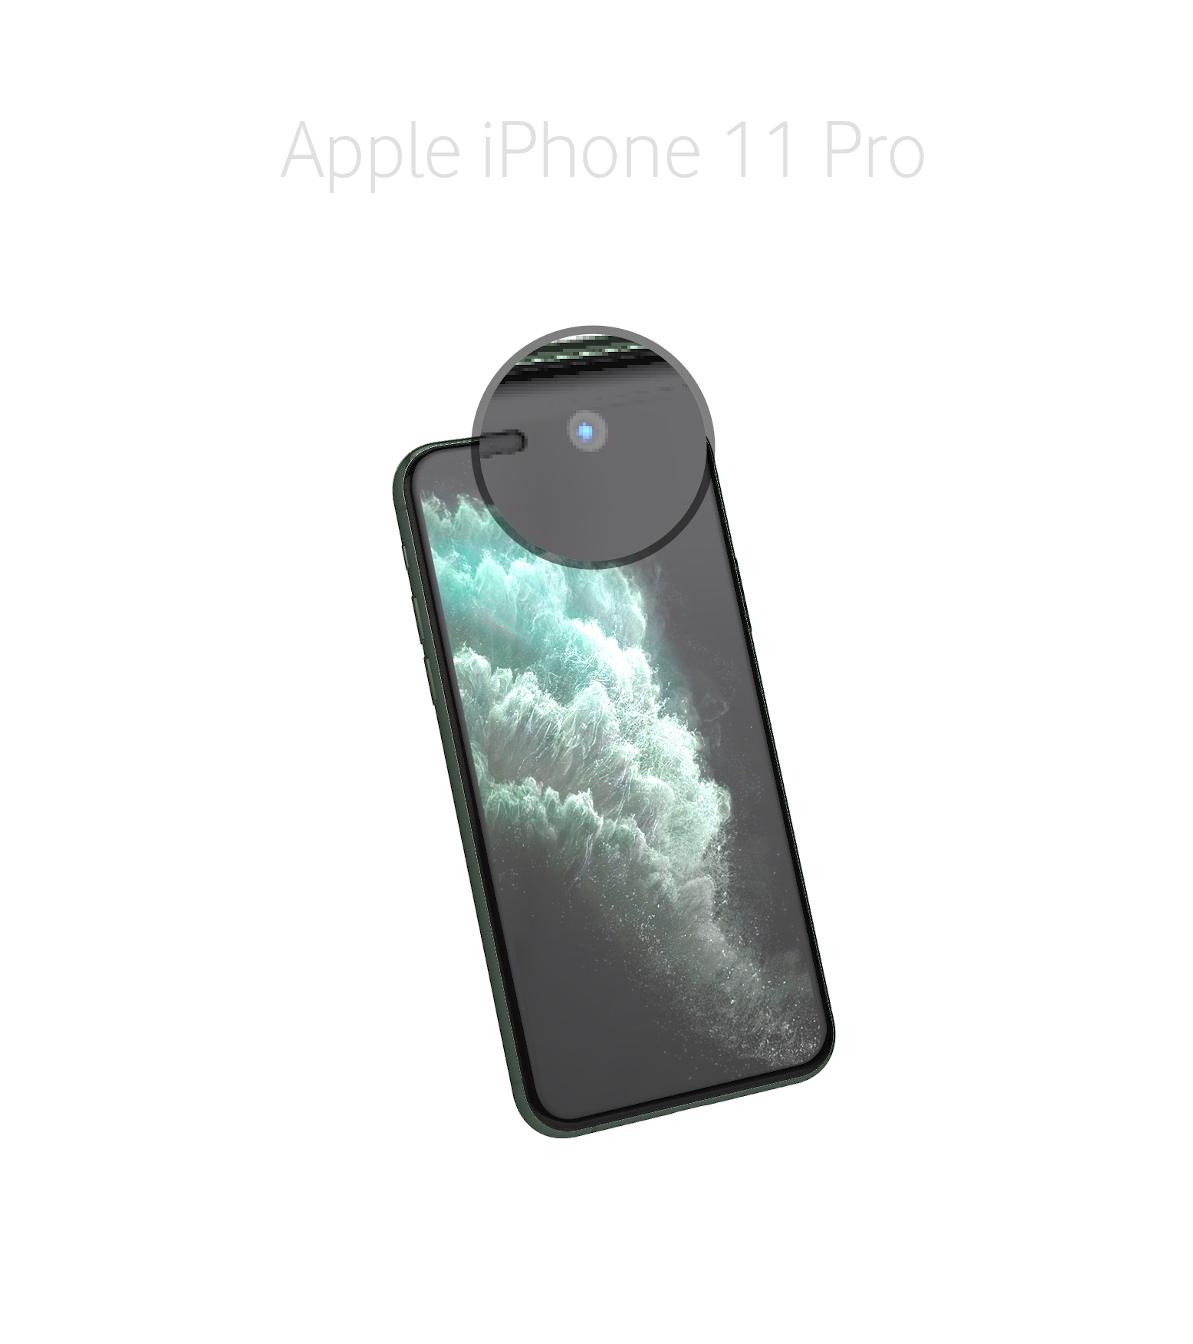 Laga kamera (selfie) iPhone 11 Pro